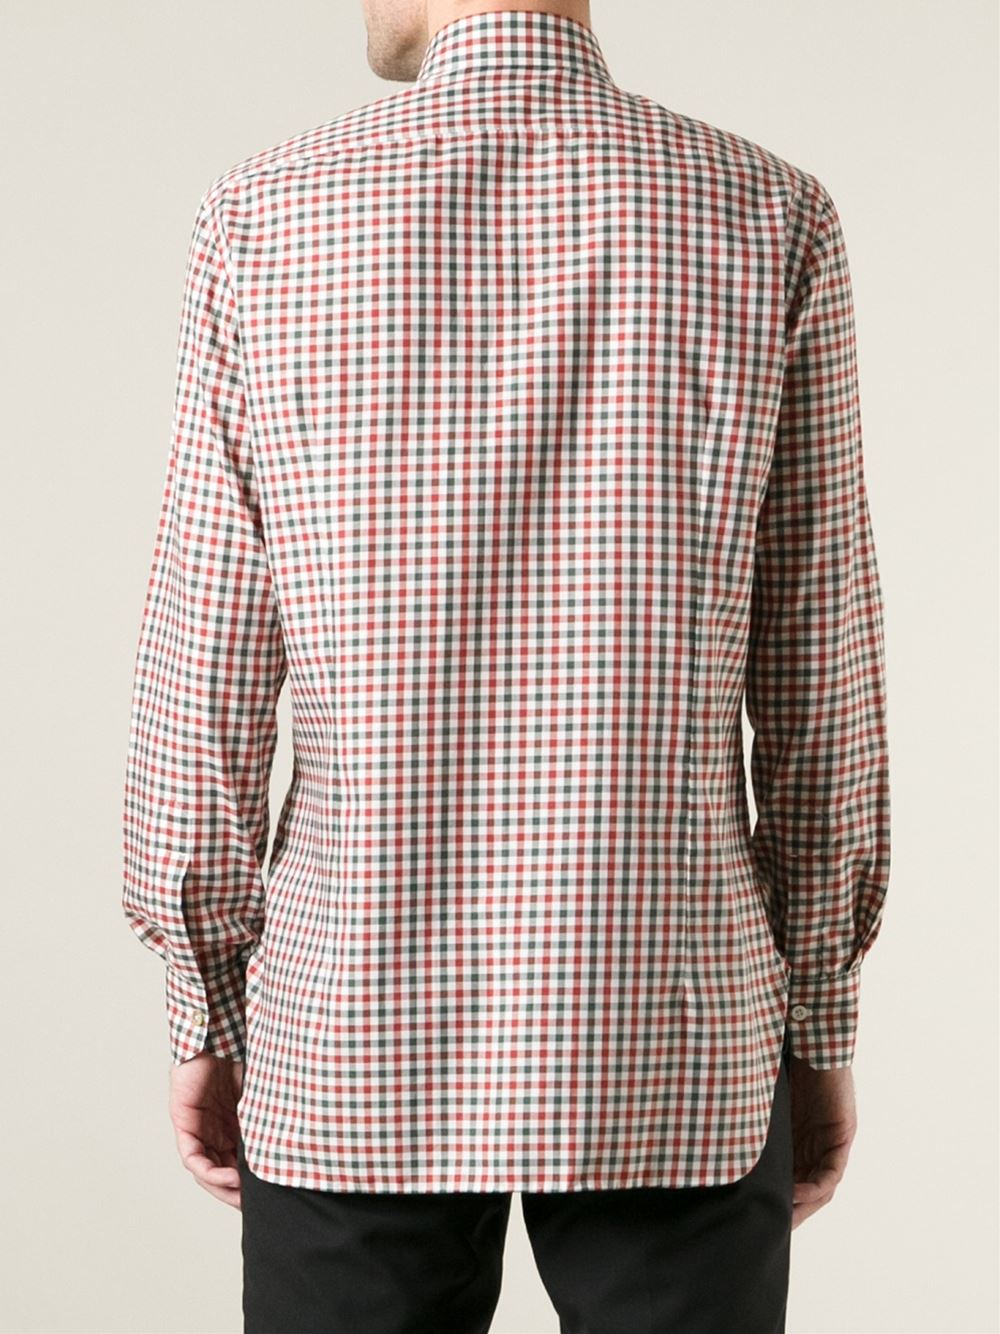 Kiton Gingham Check Shirt in Green for Men